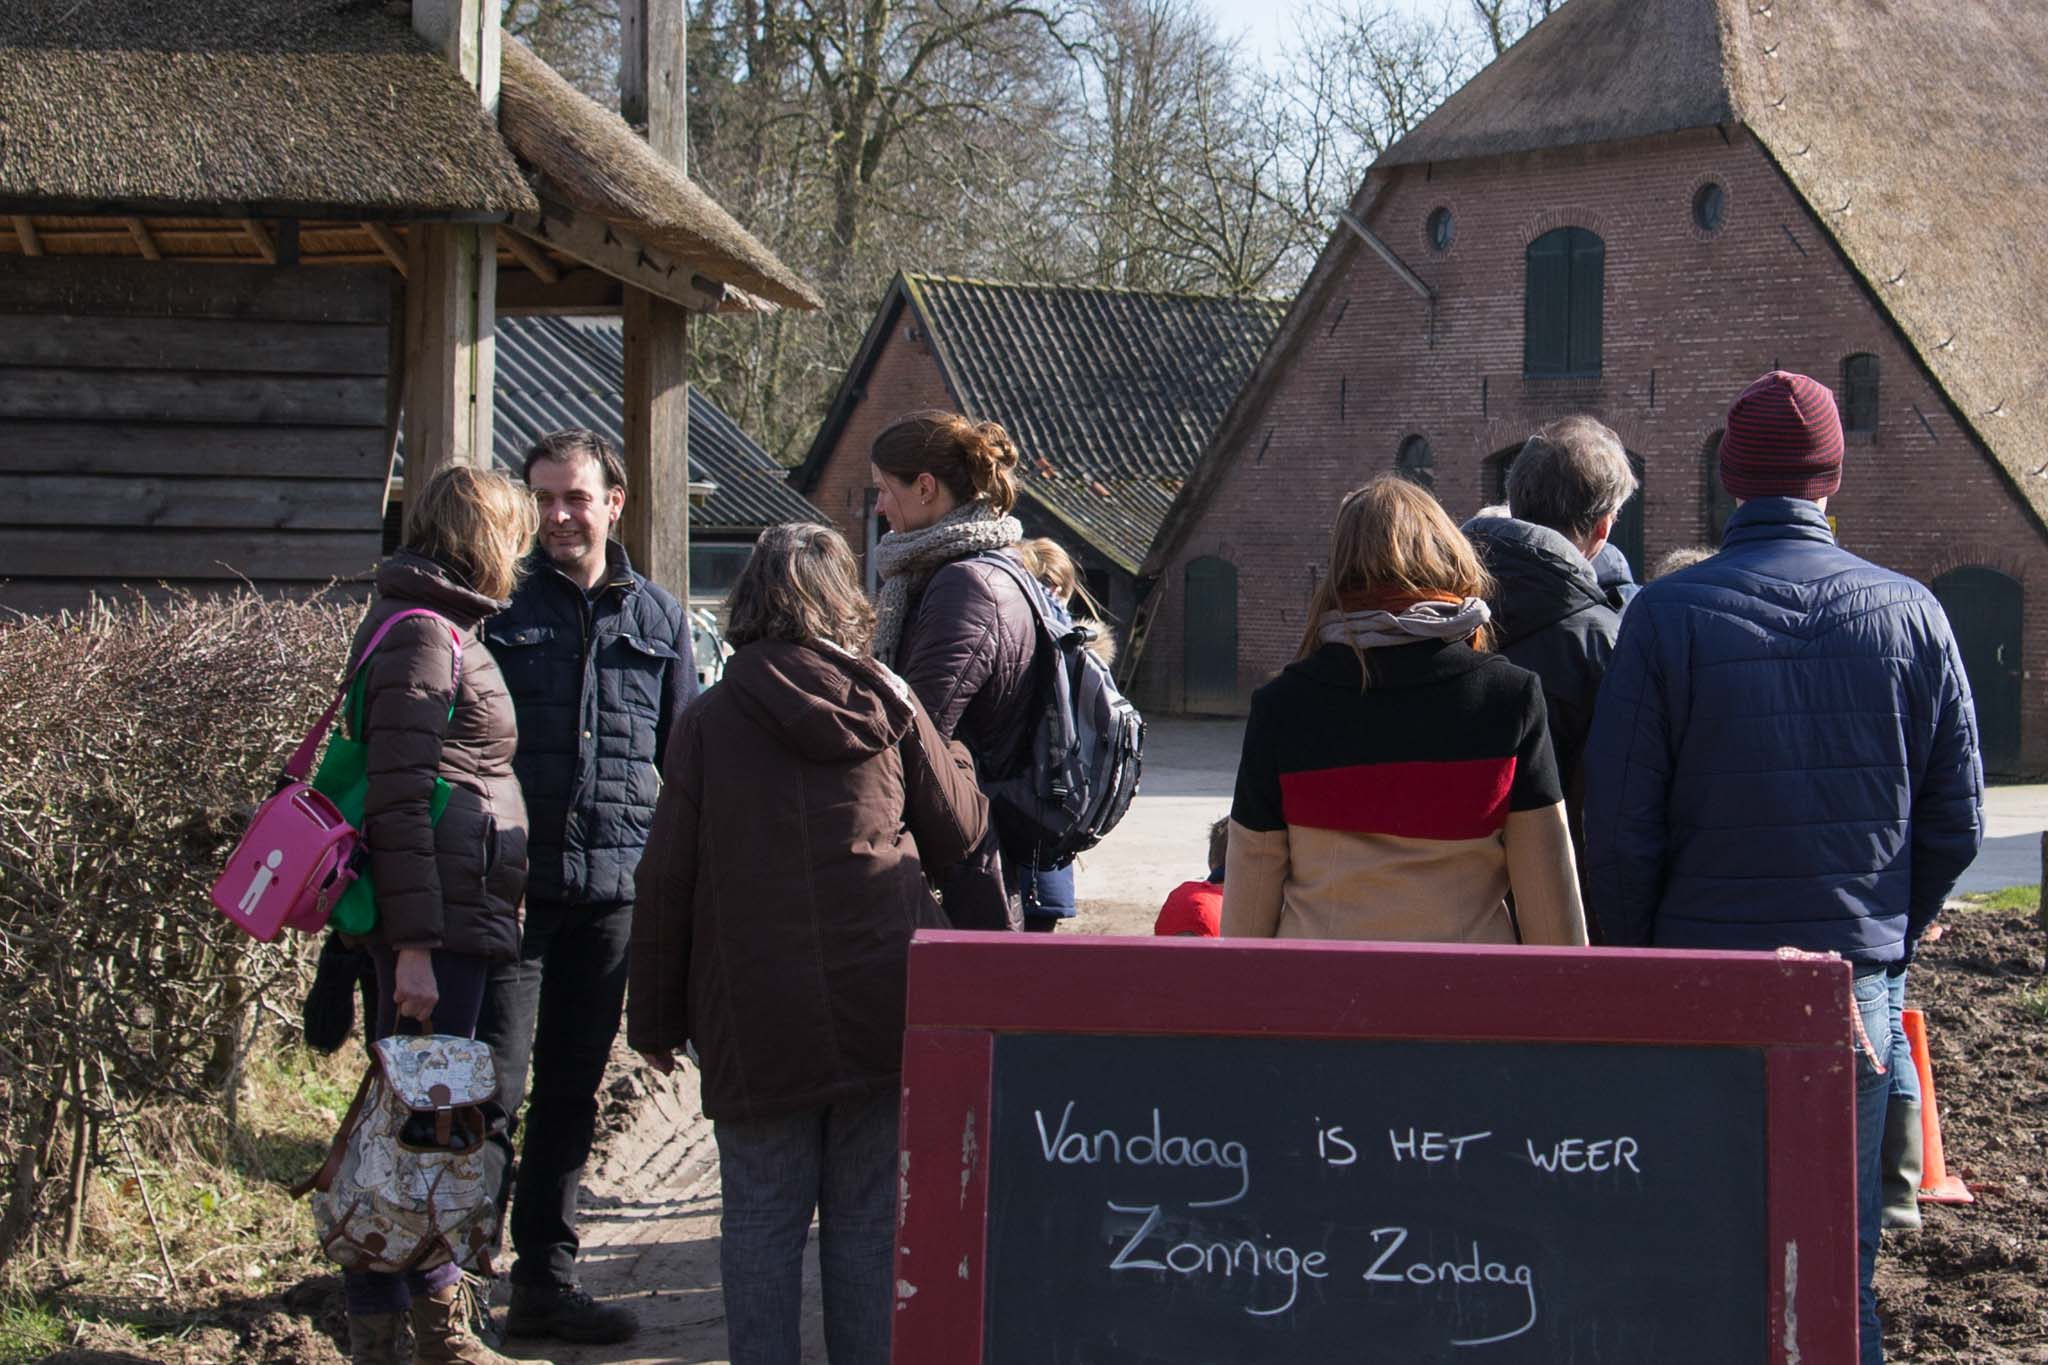 boerderij De Zonnewijzer Open dag start